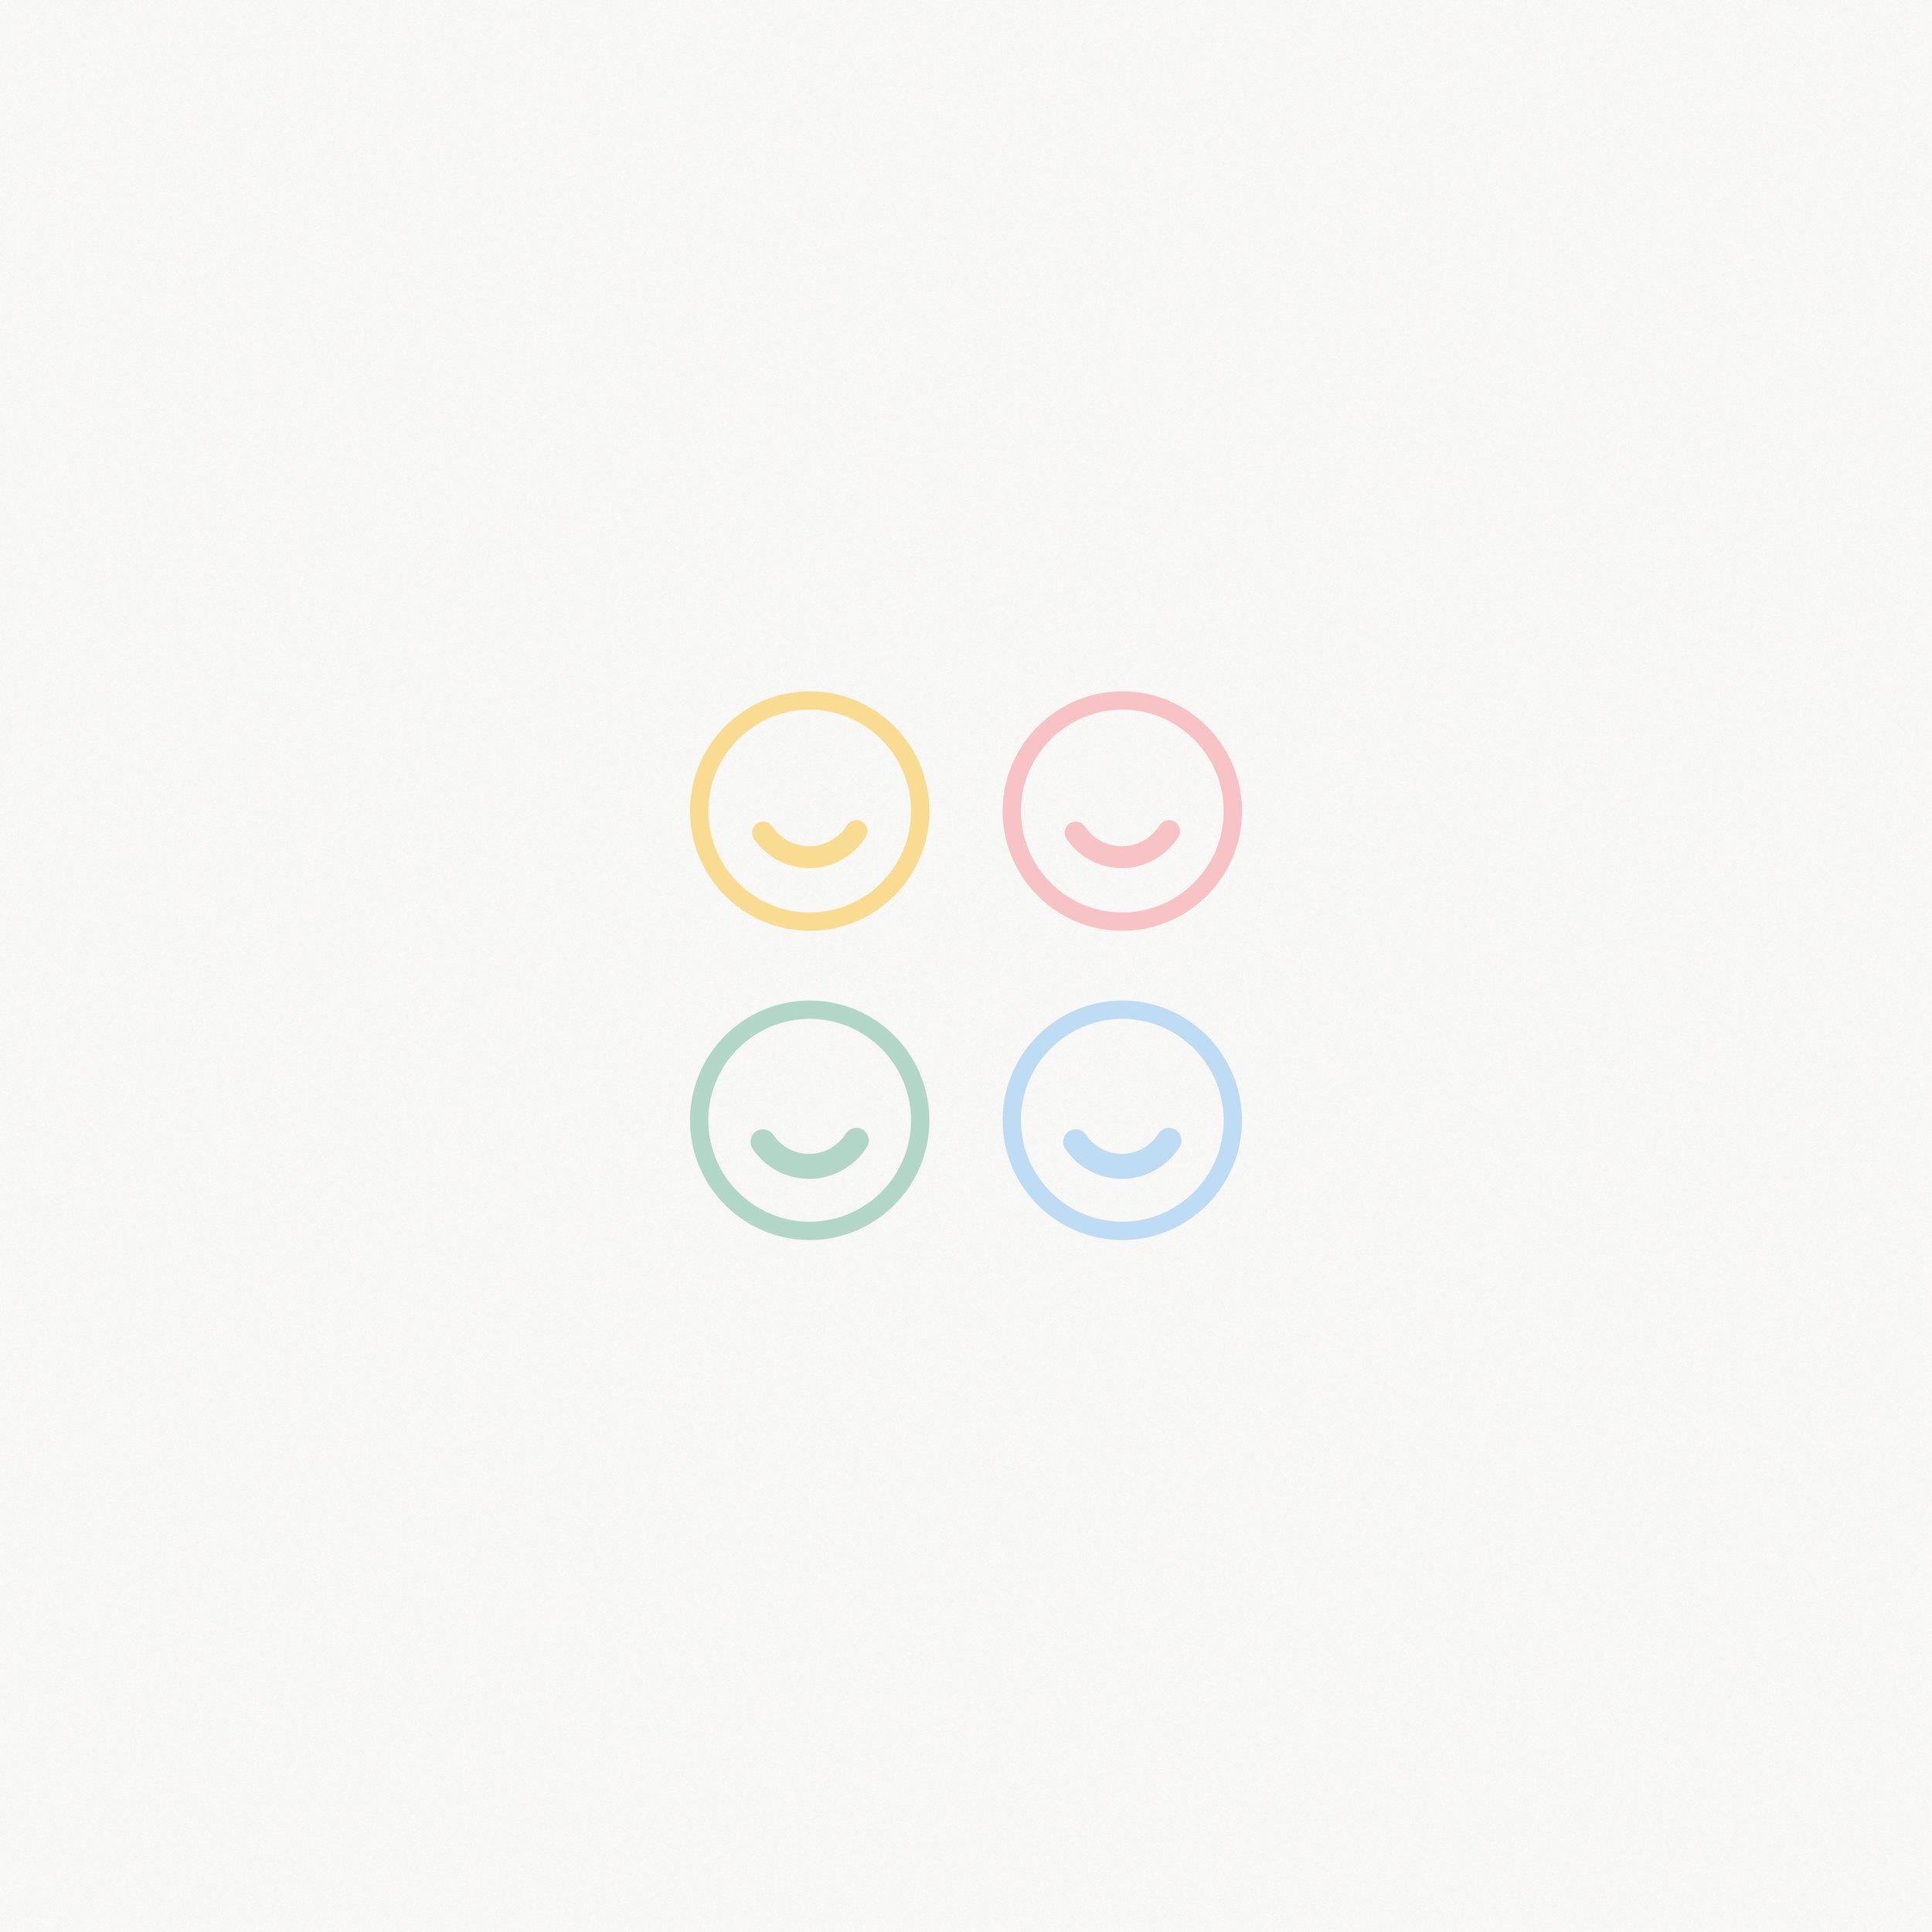 furniture-shop-branding-icons.jpg